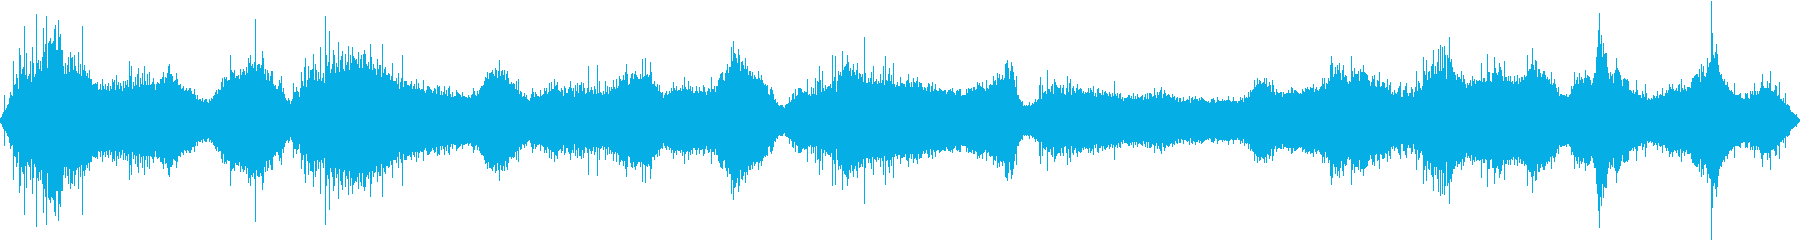 OCEAN:WAVES COMIN...の再生済みの波形